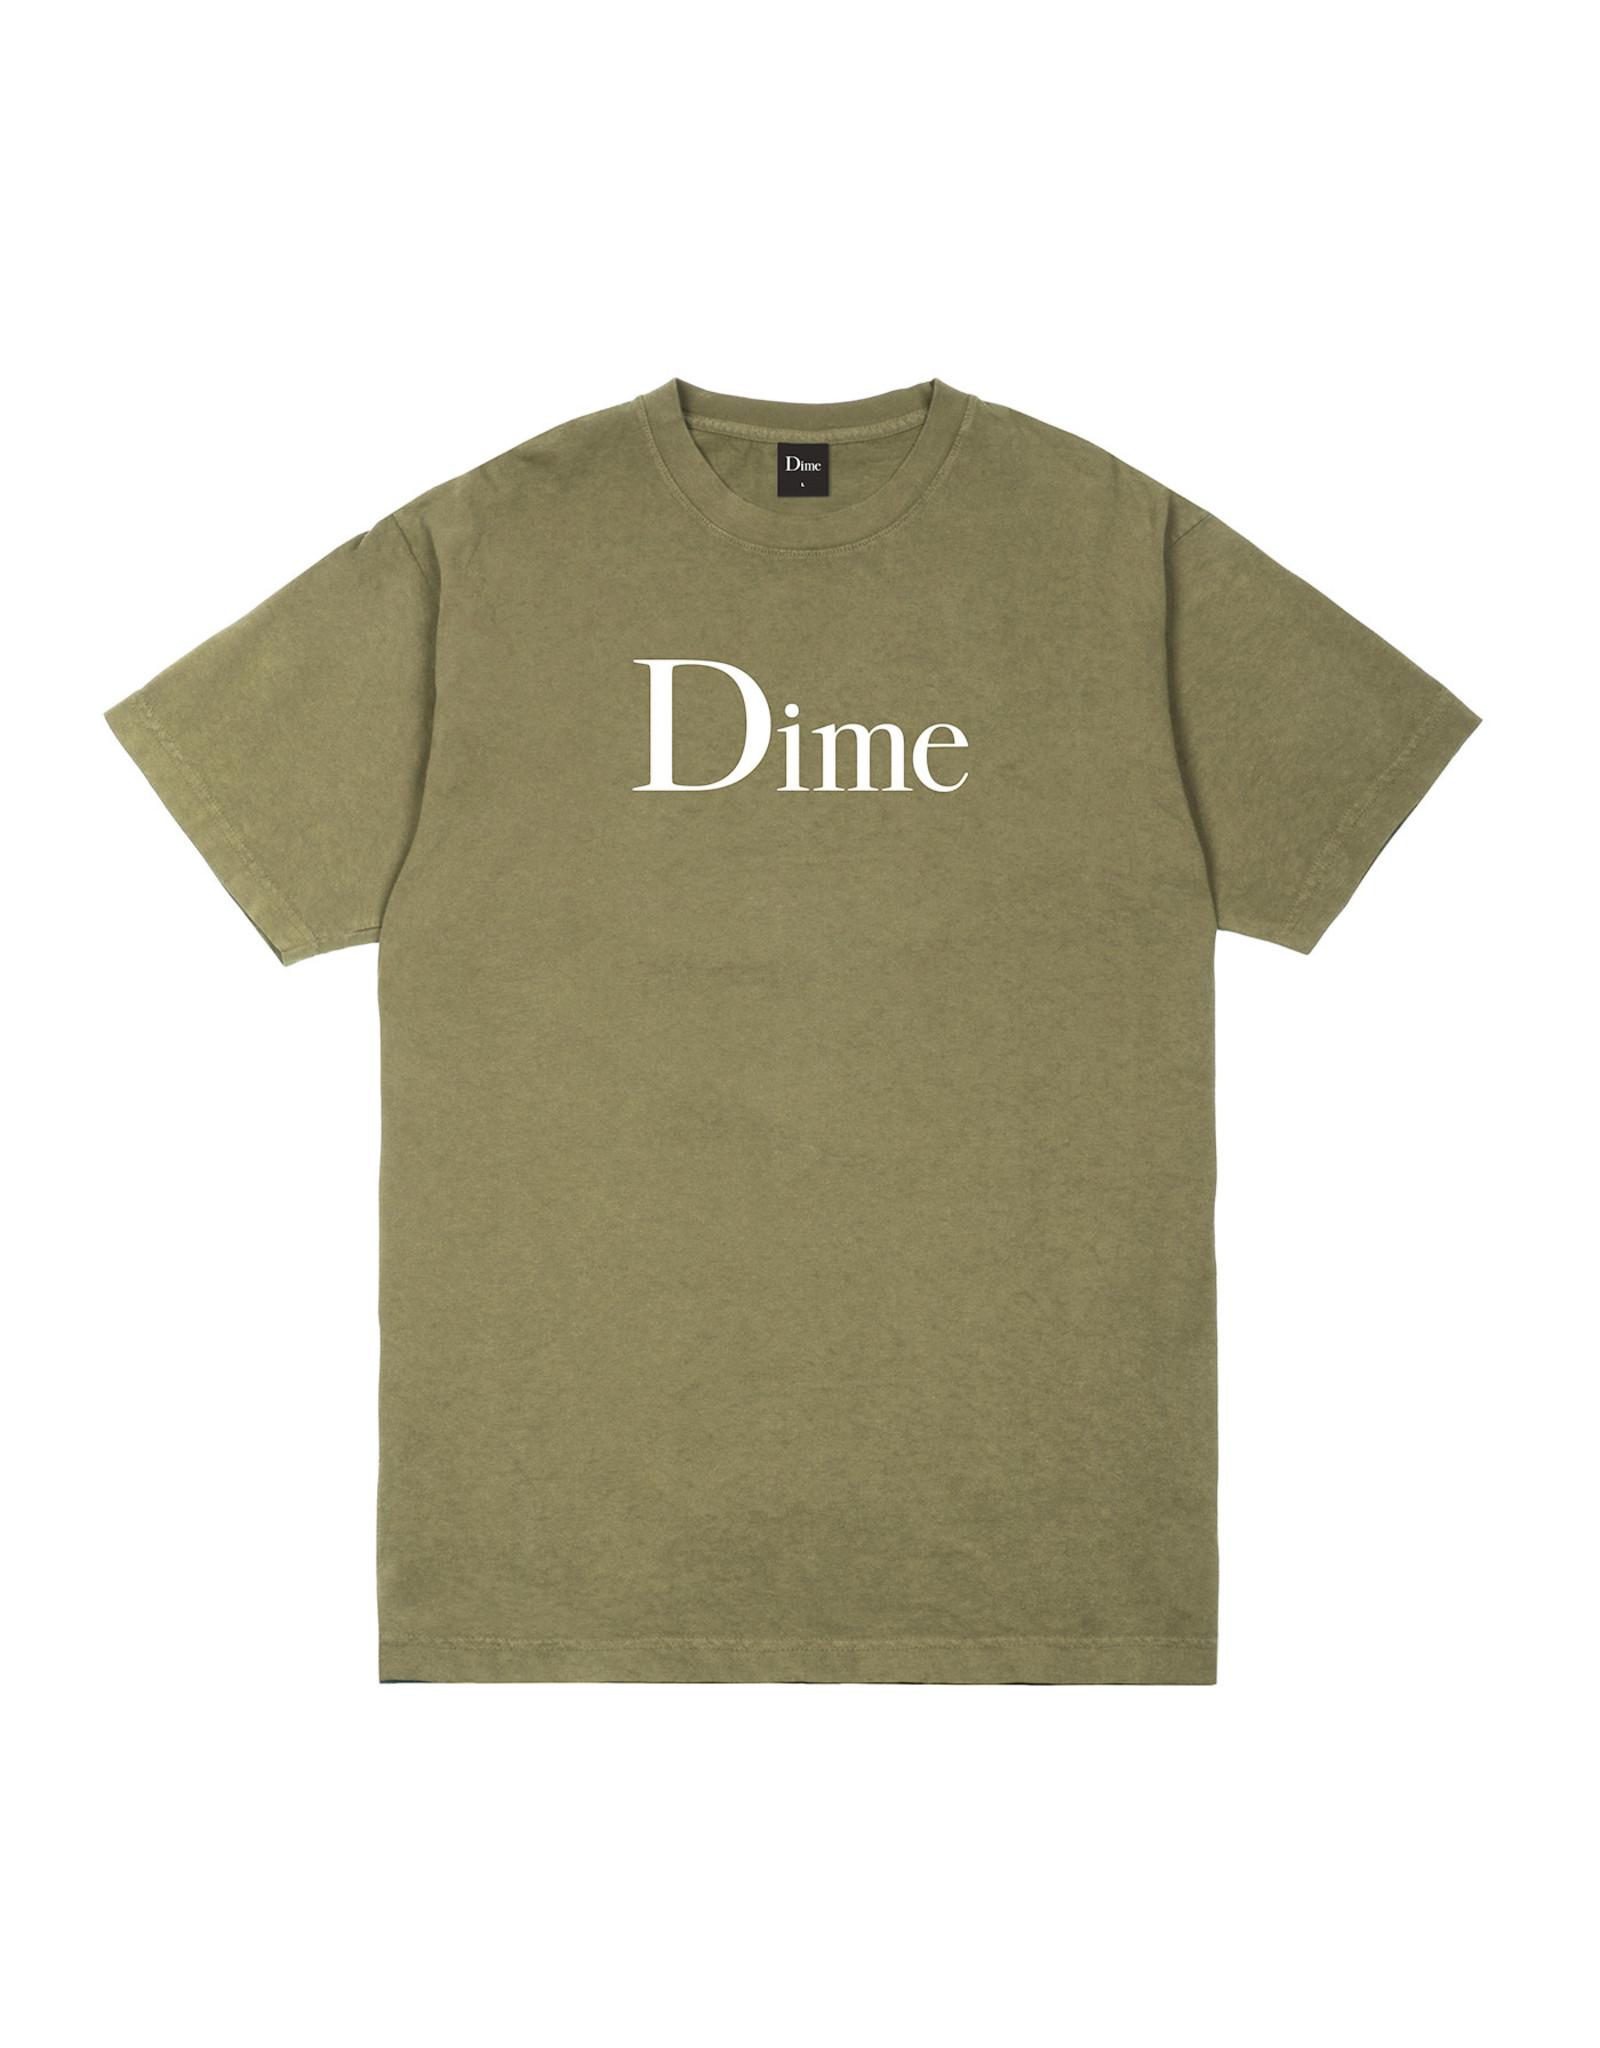 DIME DIME T-SHIRT BIEGE